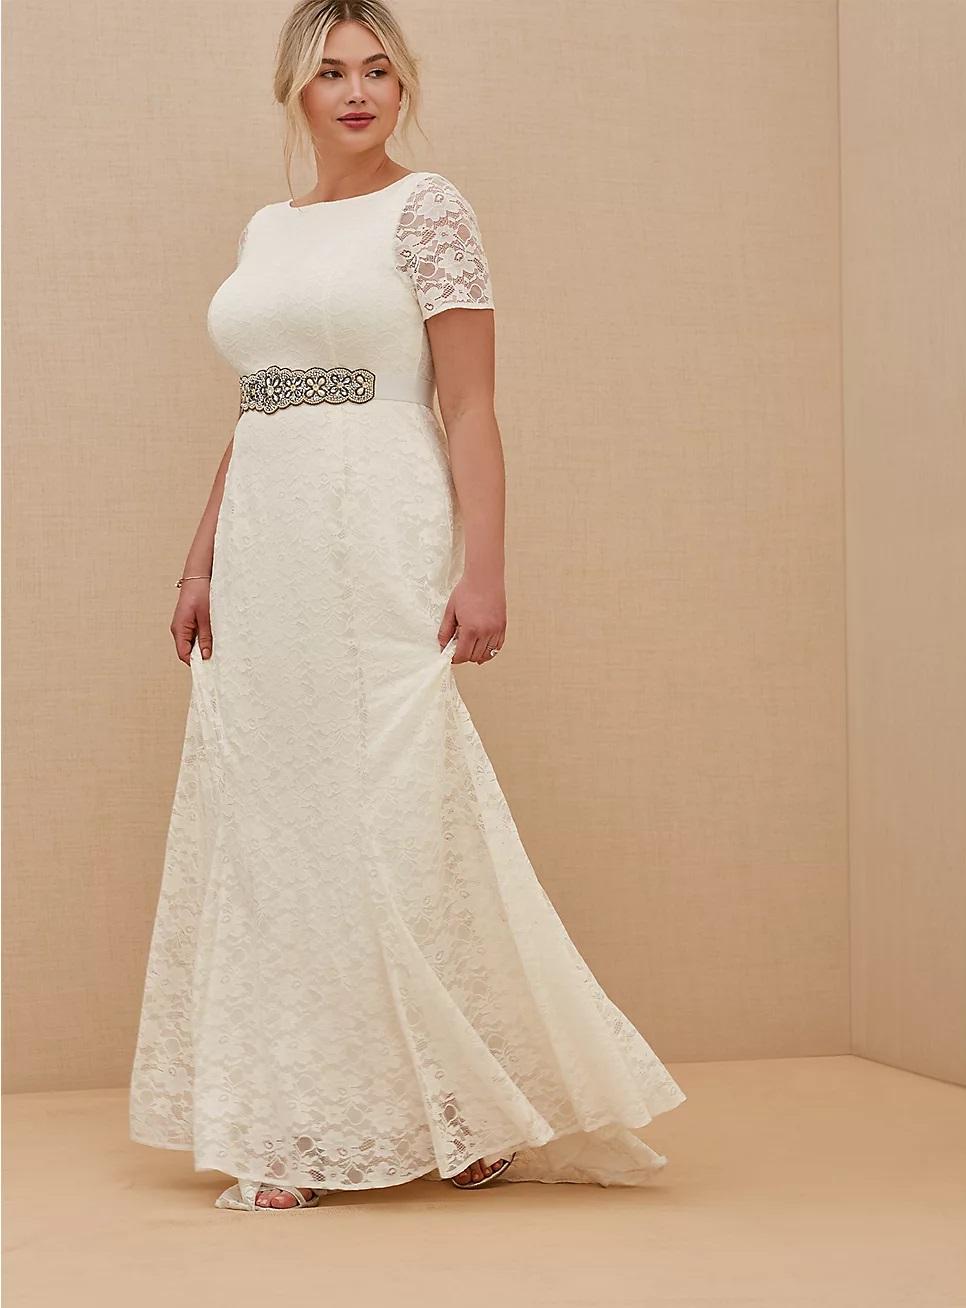 torrid wedding dress plus size in white lace, short sleeve